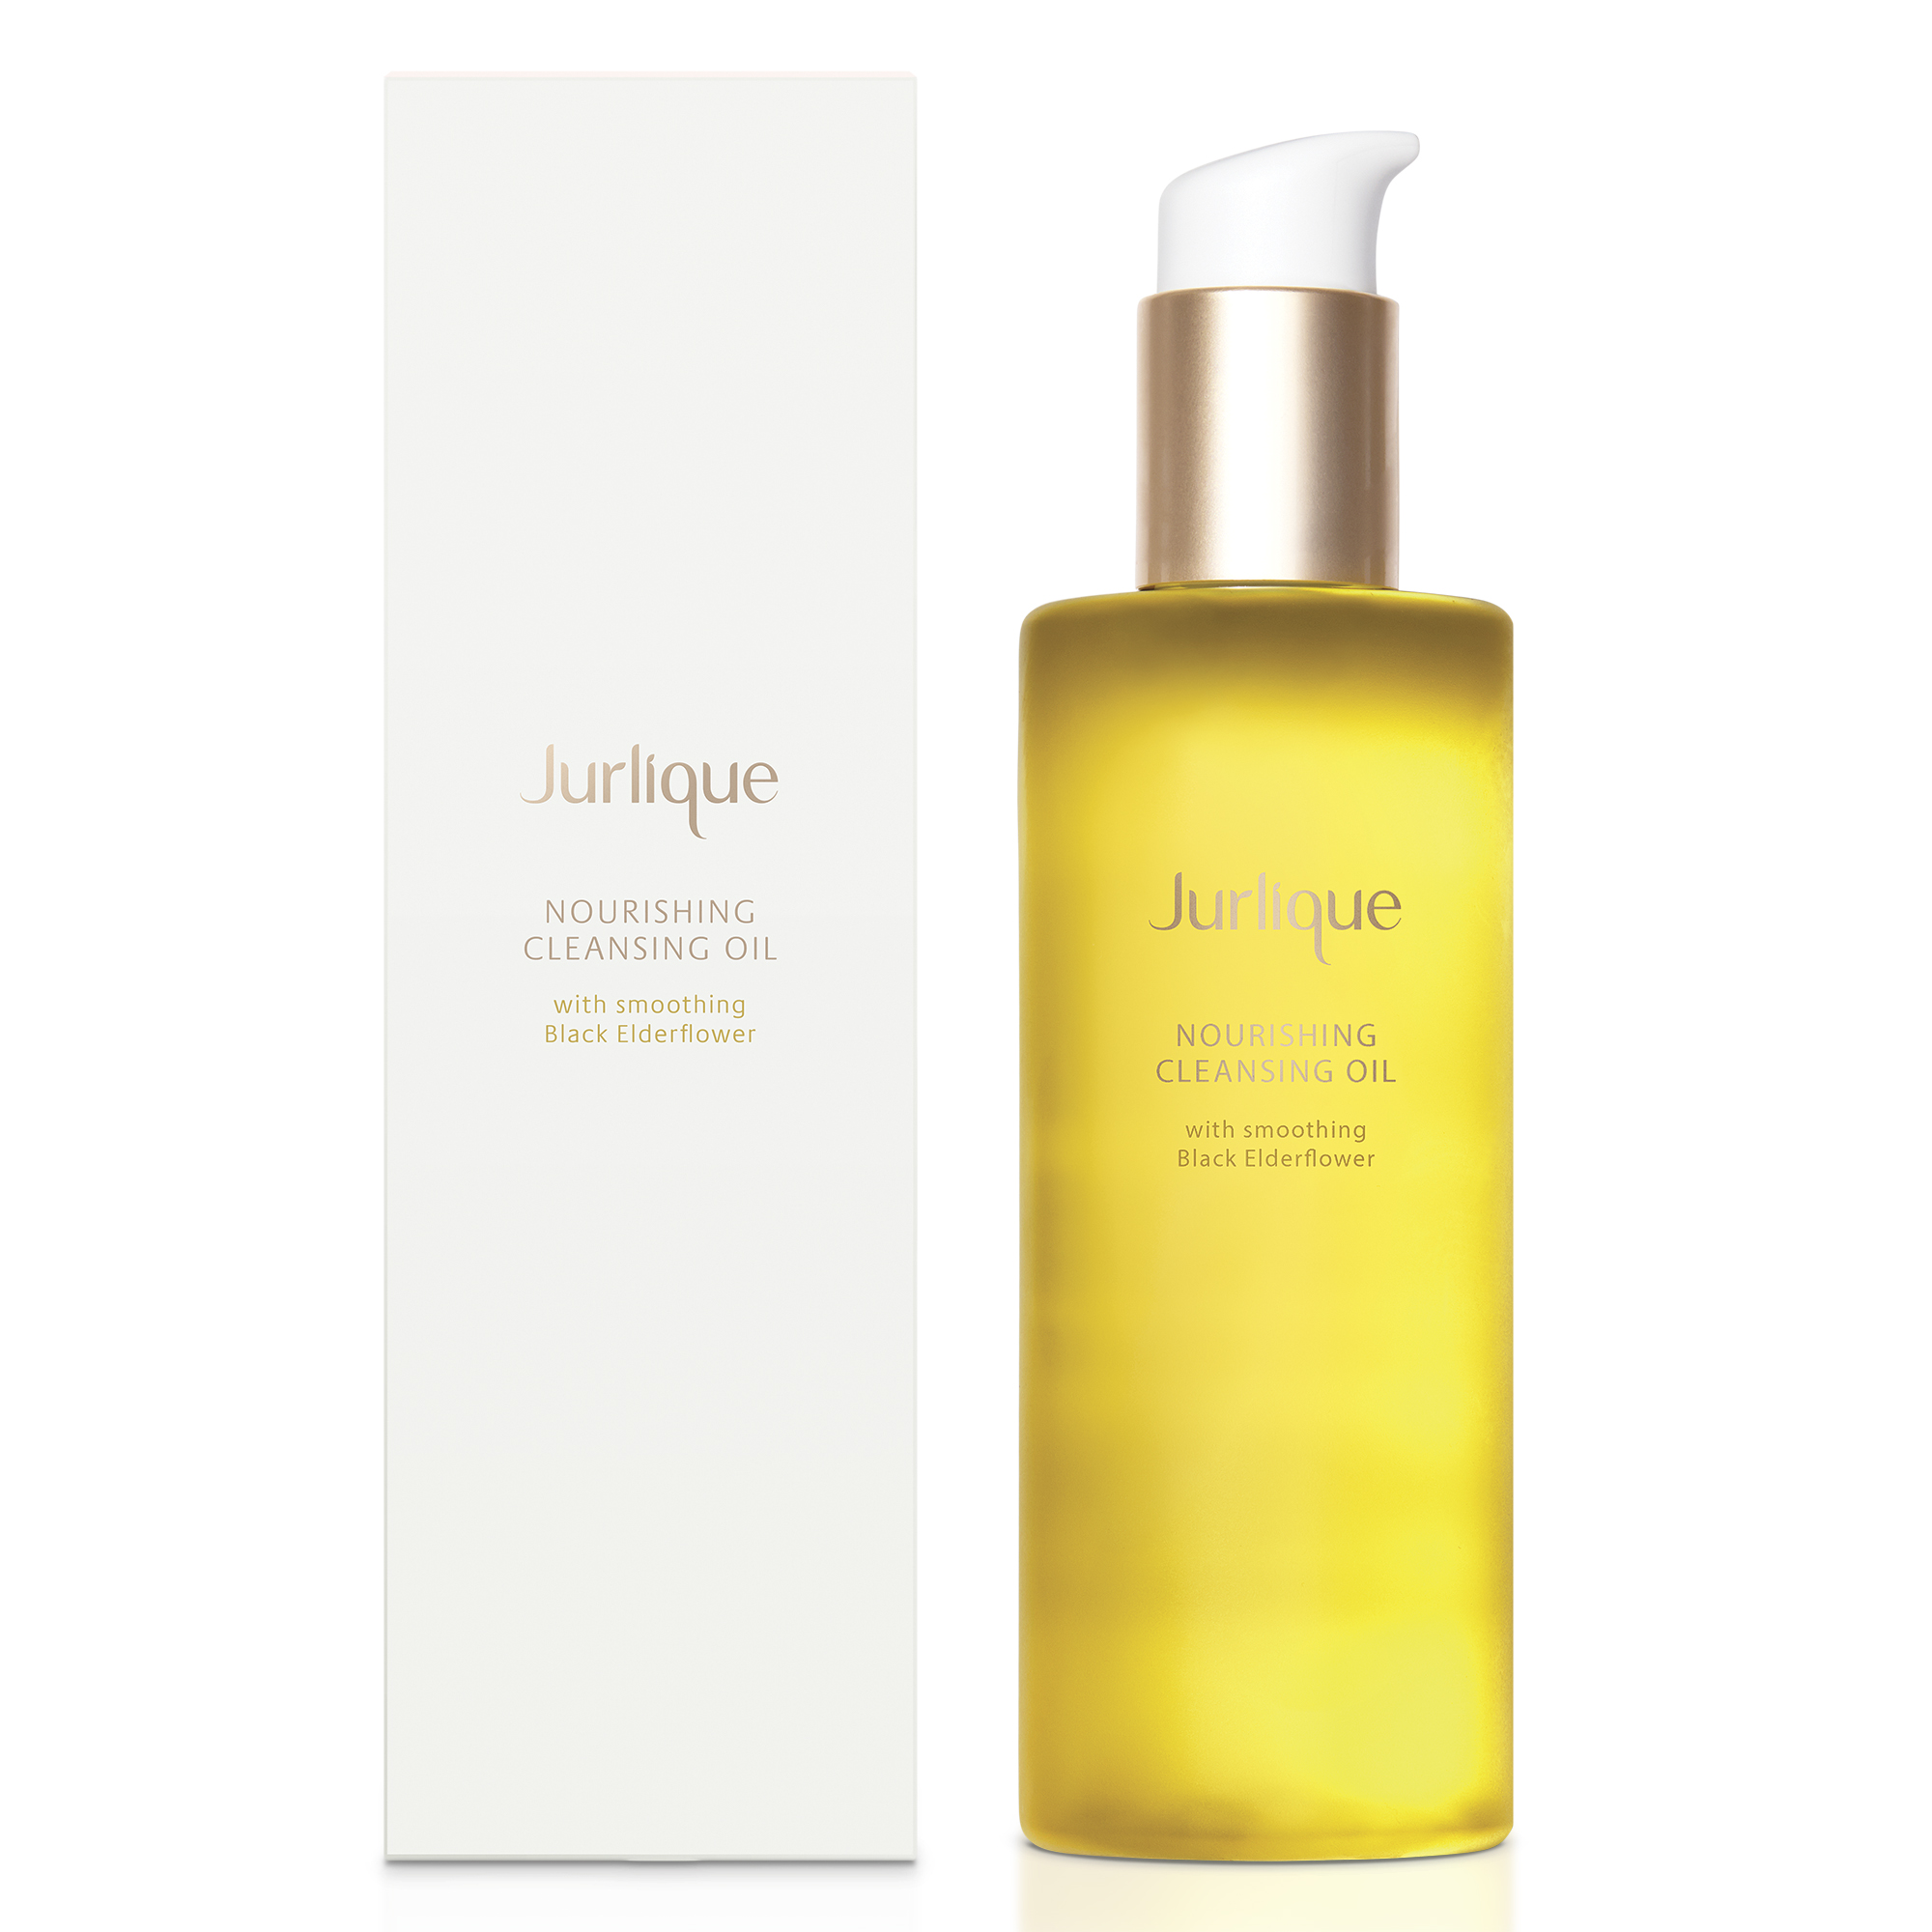 Jurlique Nourishing Cleansing Oil, 200 ml